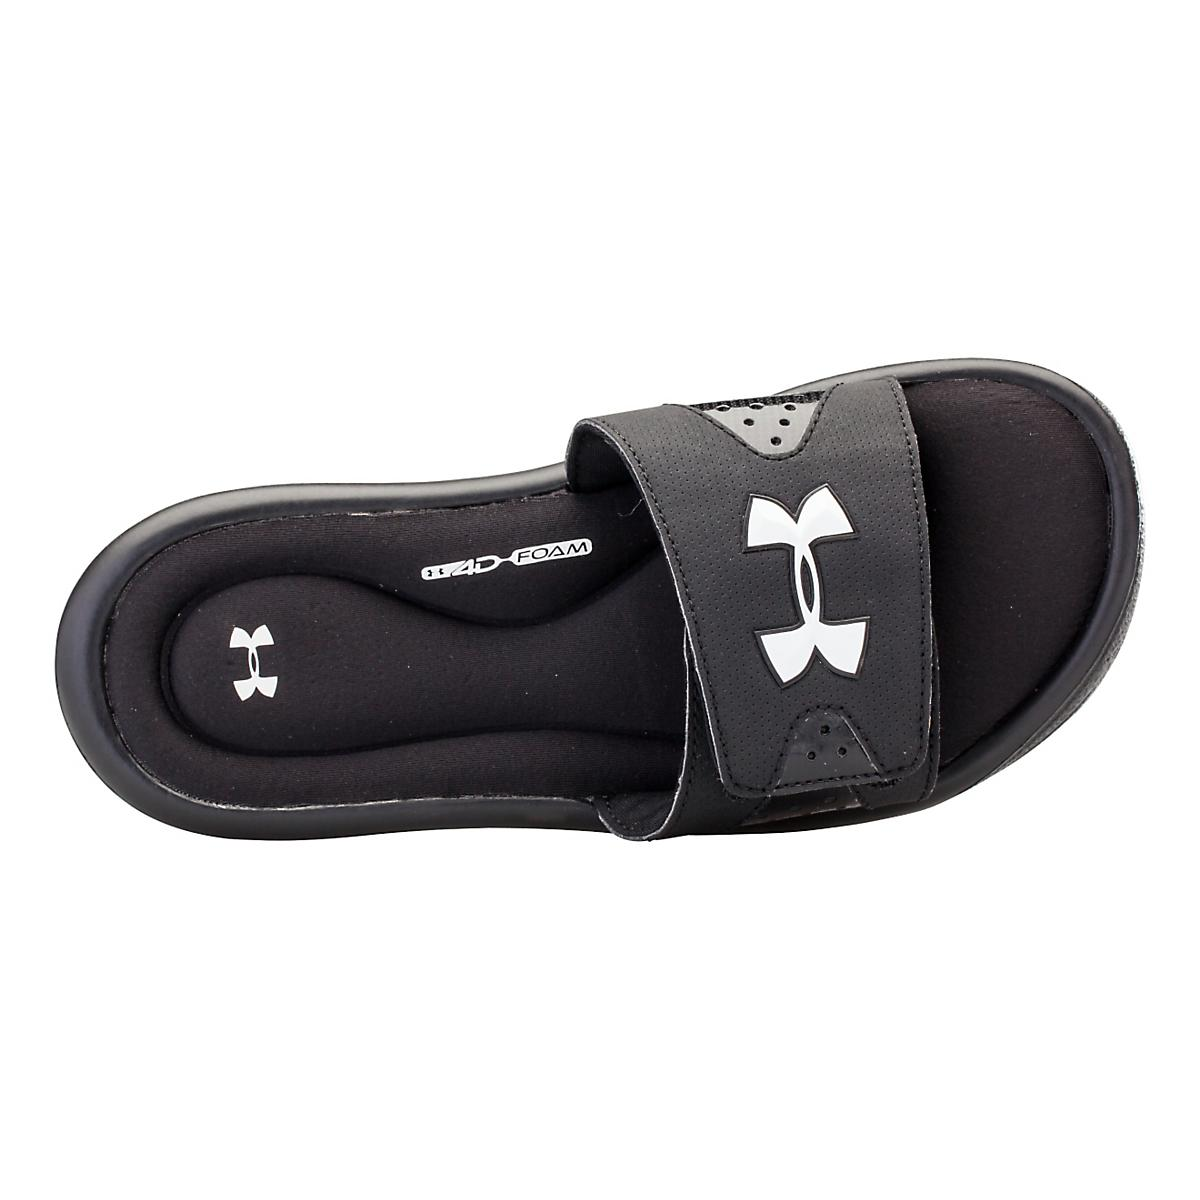 e229d2be3 Under Armour Ignite IV SL Sandals Shoe